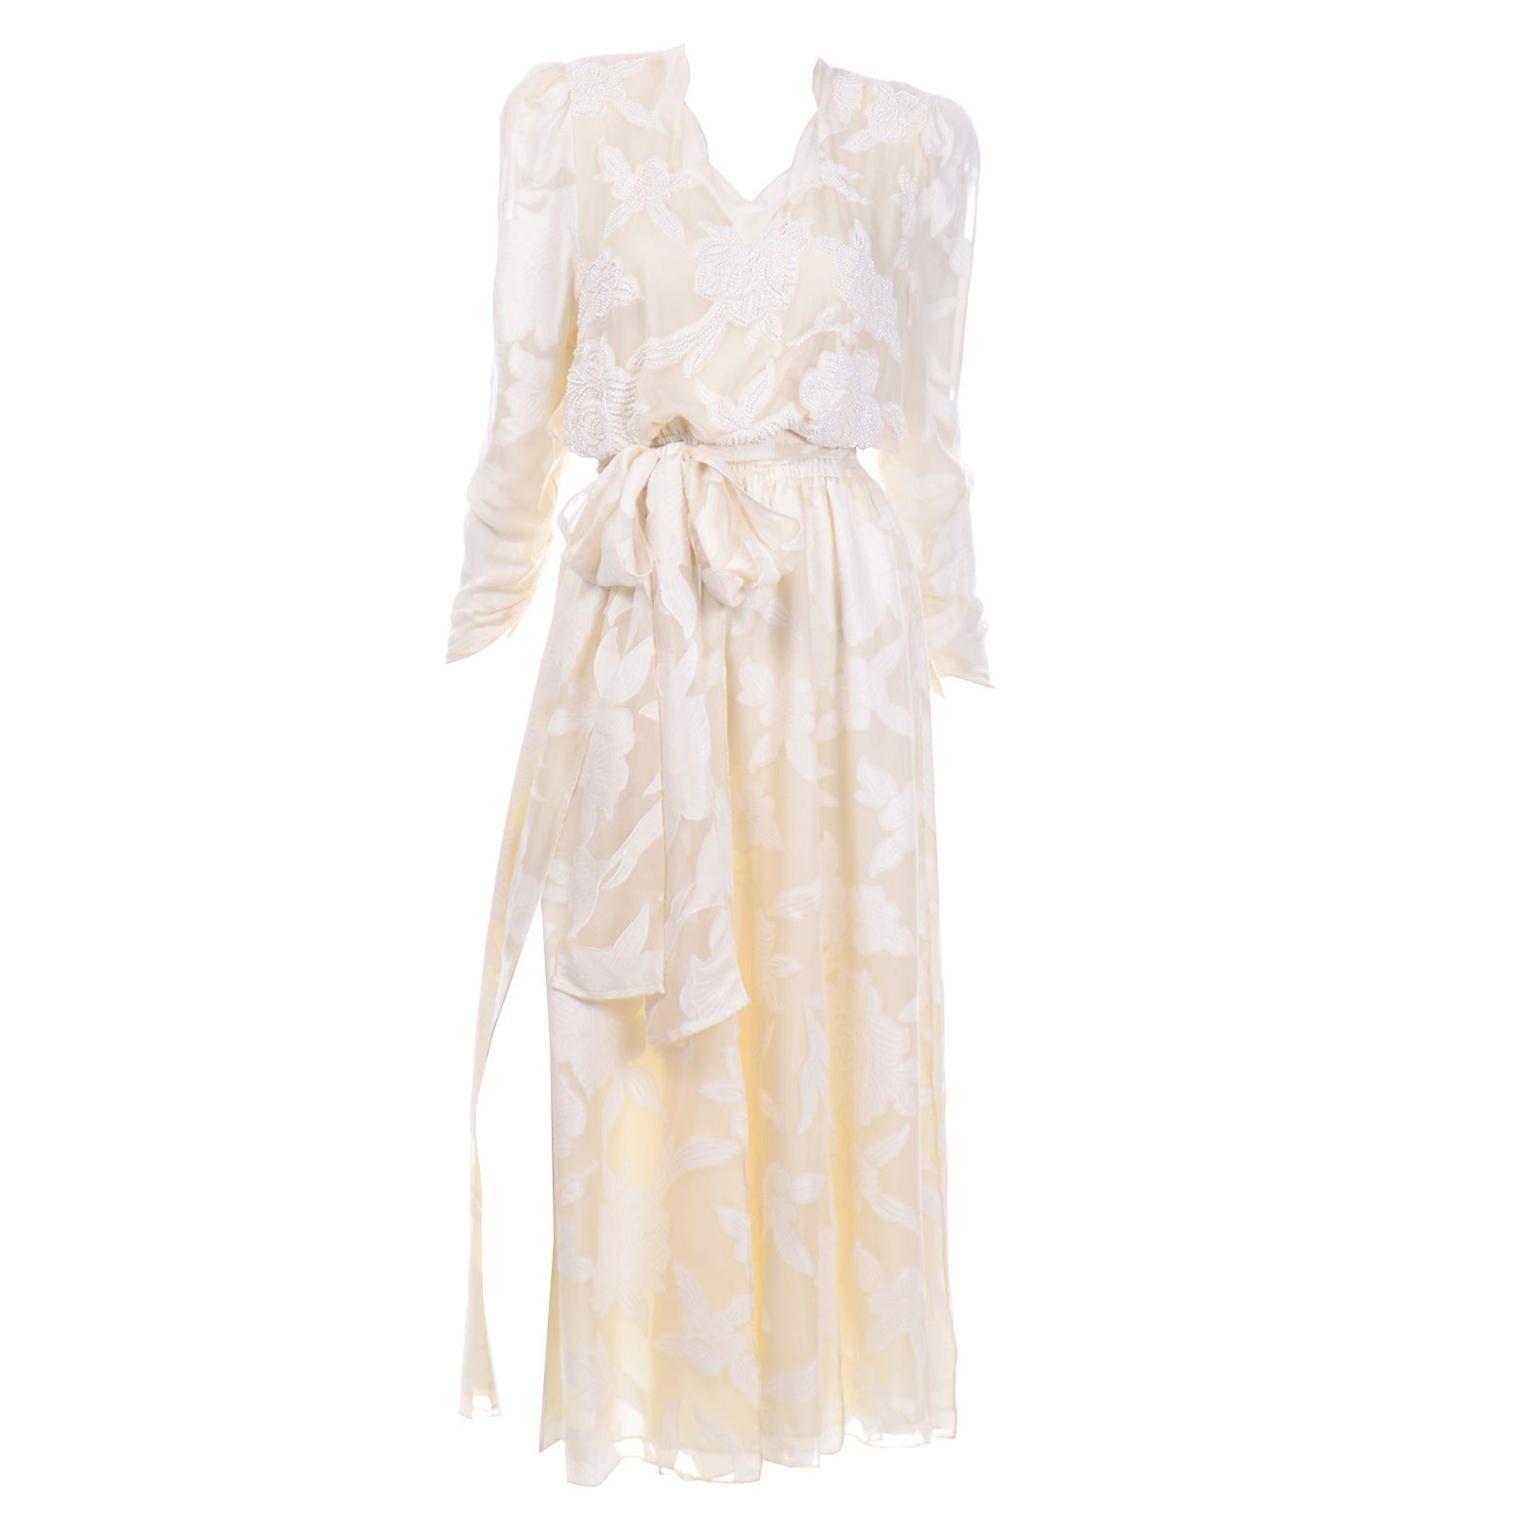 1980s Diane Freis Beaded Ivory Silk Floral Vintage Dress W Sash or Scarf